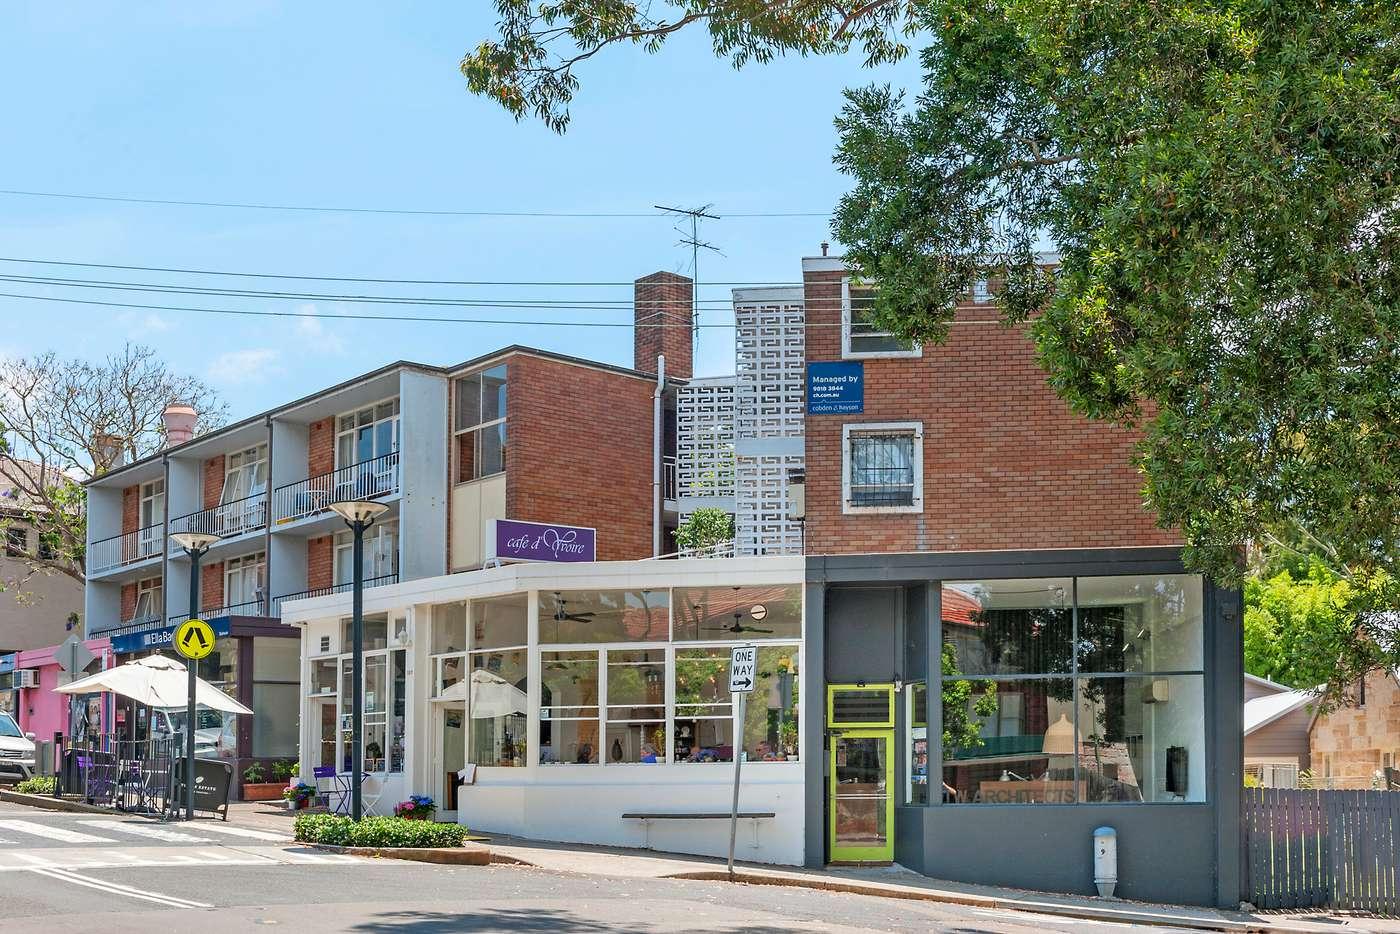 Main view of Homely studio listing, 3/189 Darling Street, Balmain NSW 2041